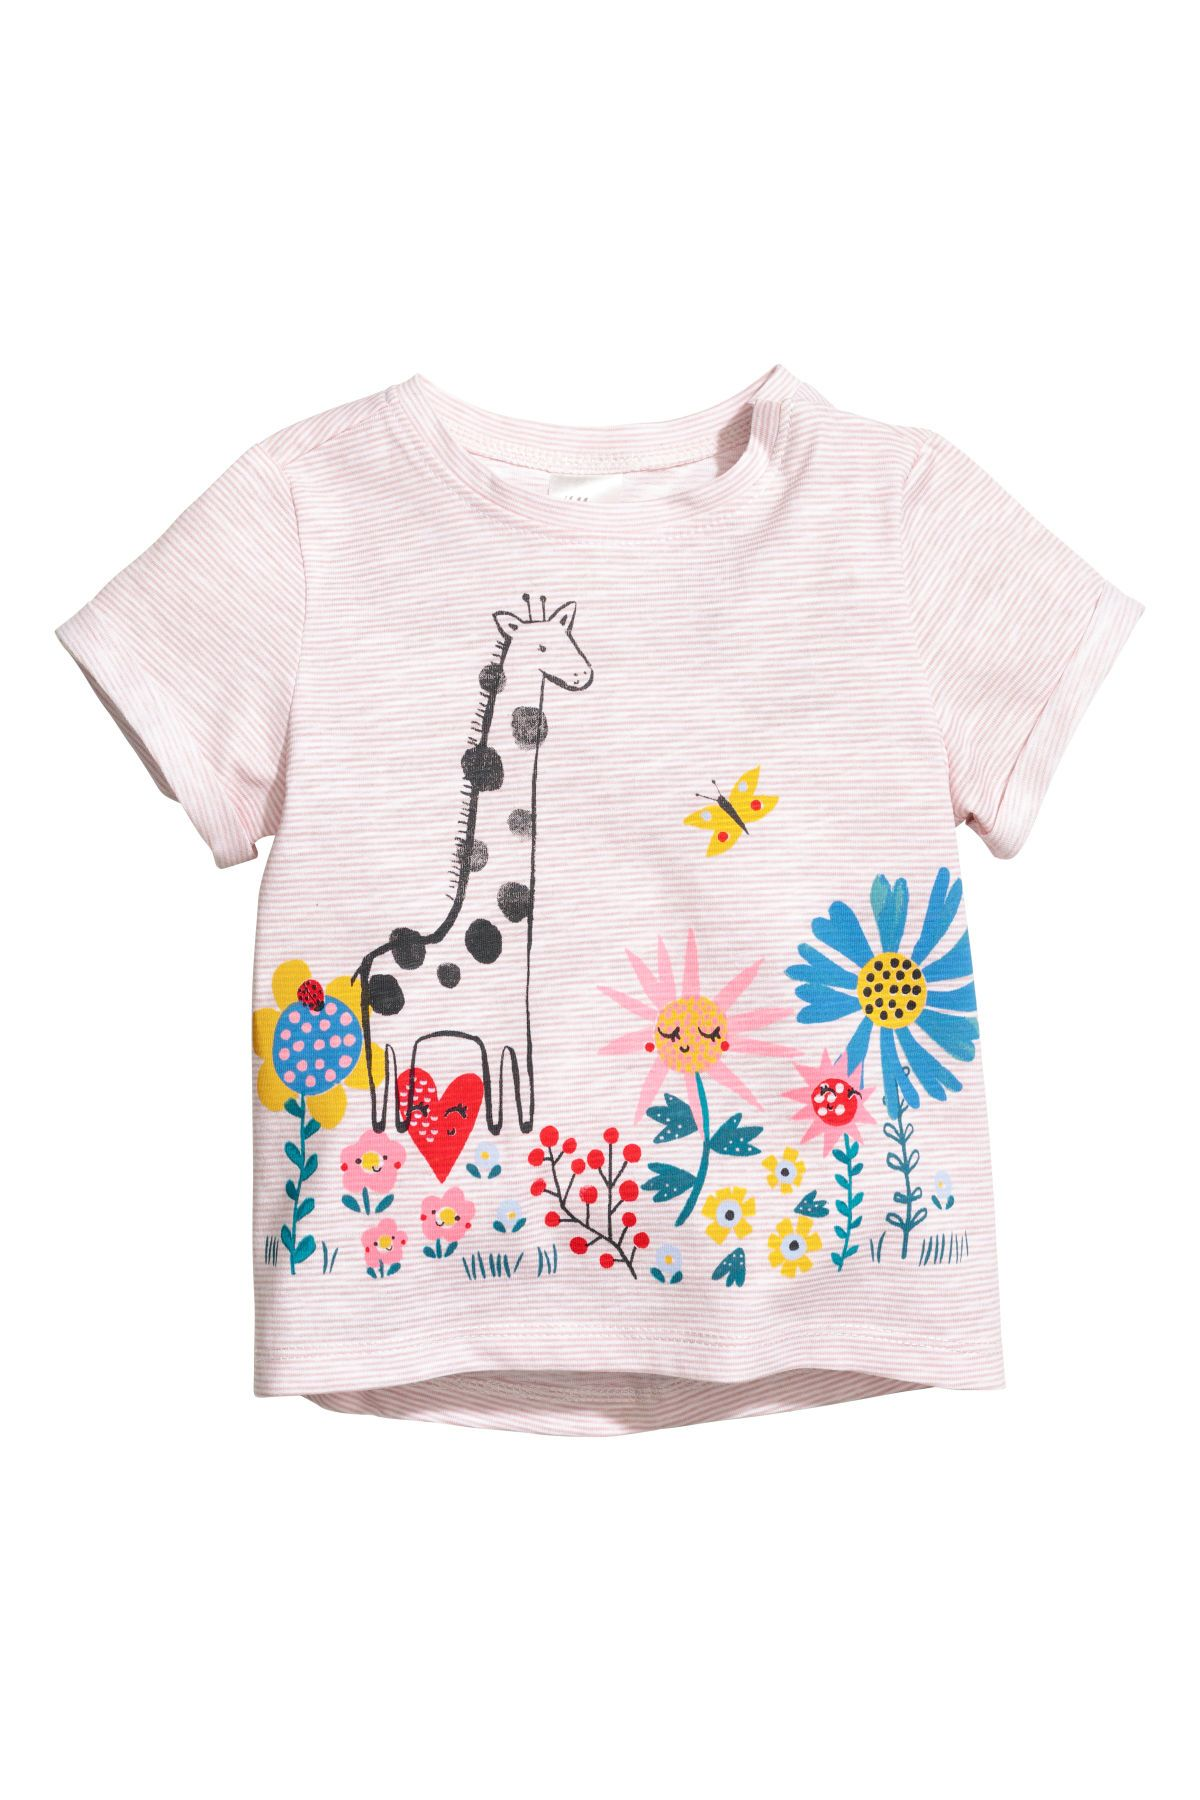 d35639d9 Jersey Top with Printed Design | Pink/giraffe | KIDS | H&M US ...